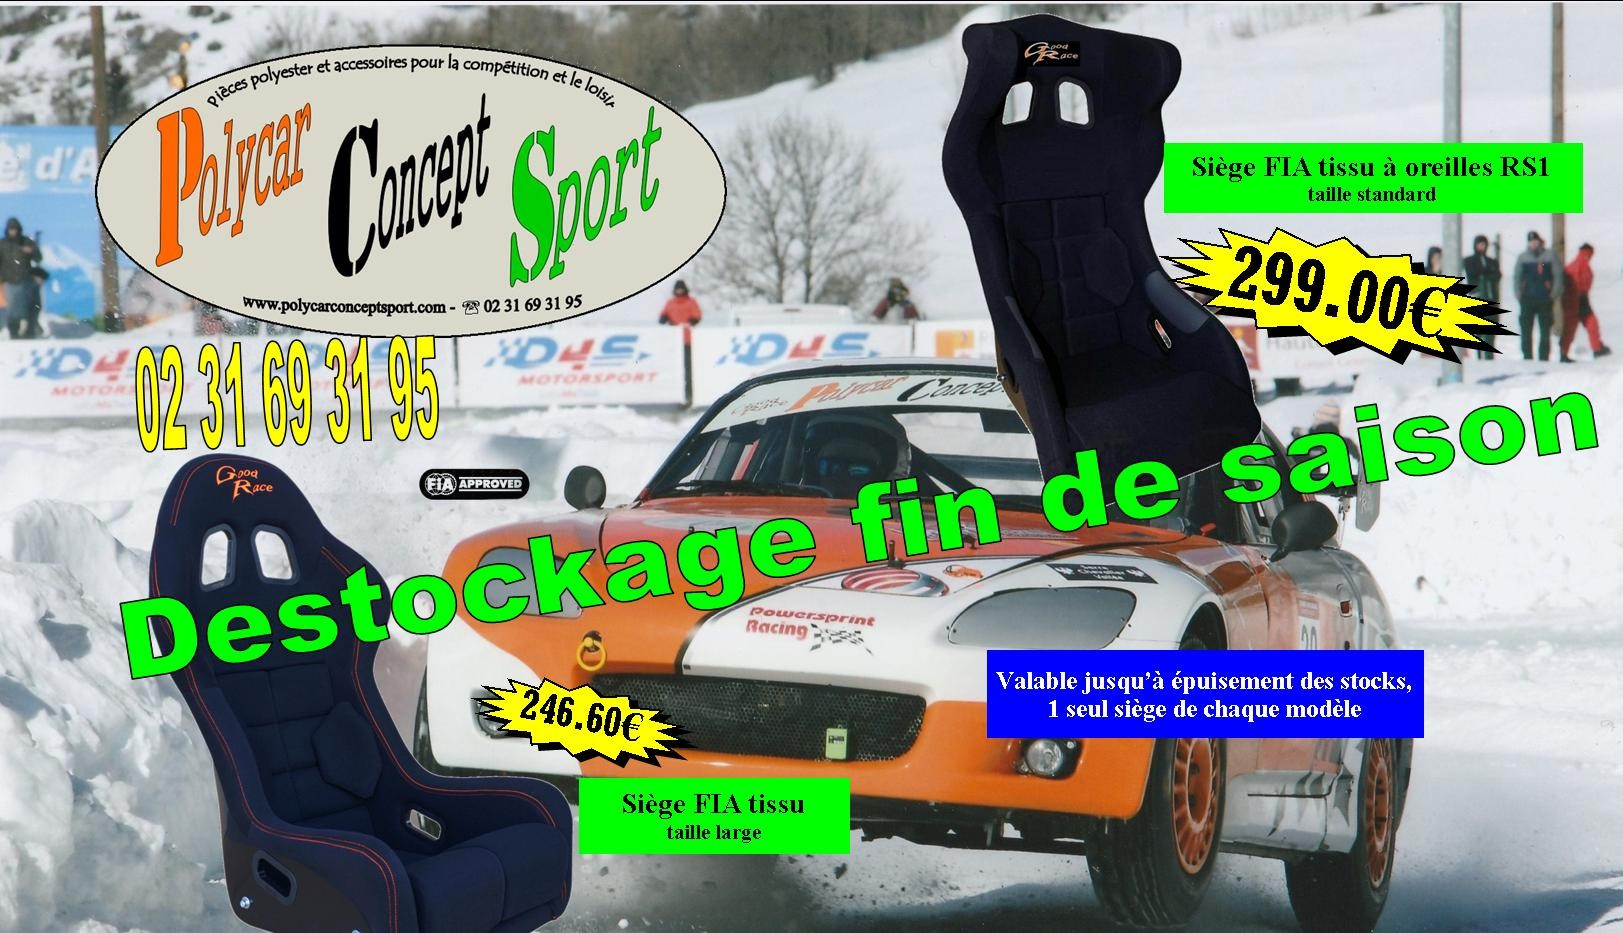 Destockage Good Race 2017